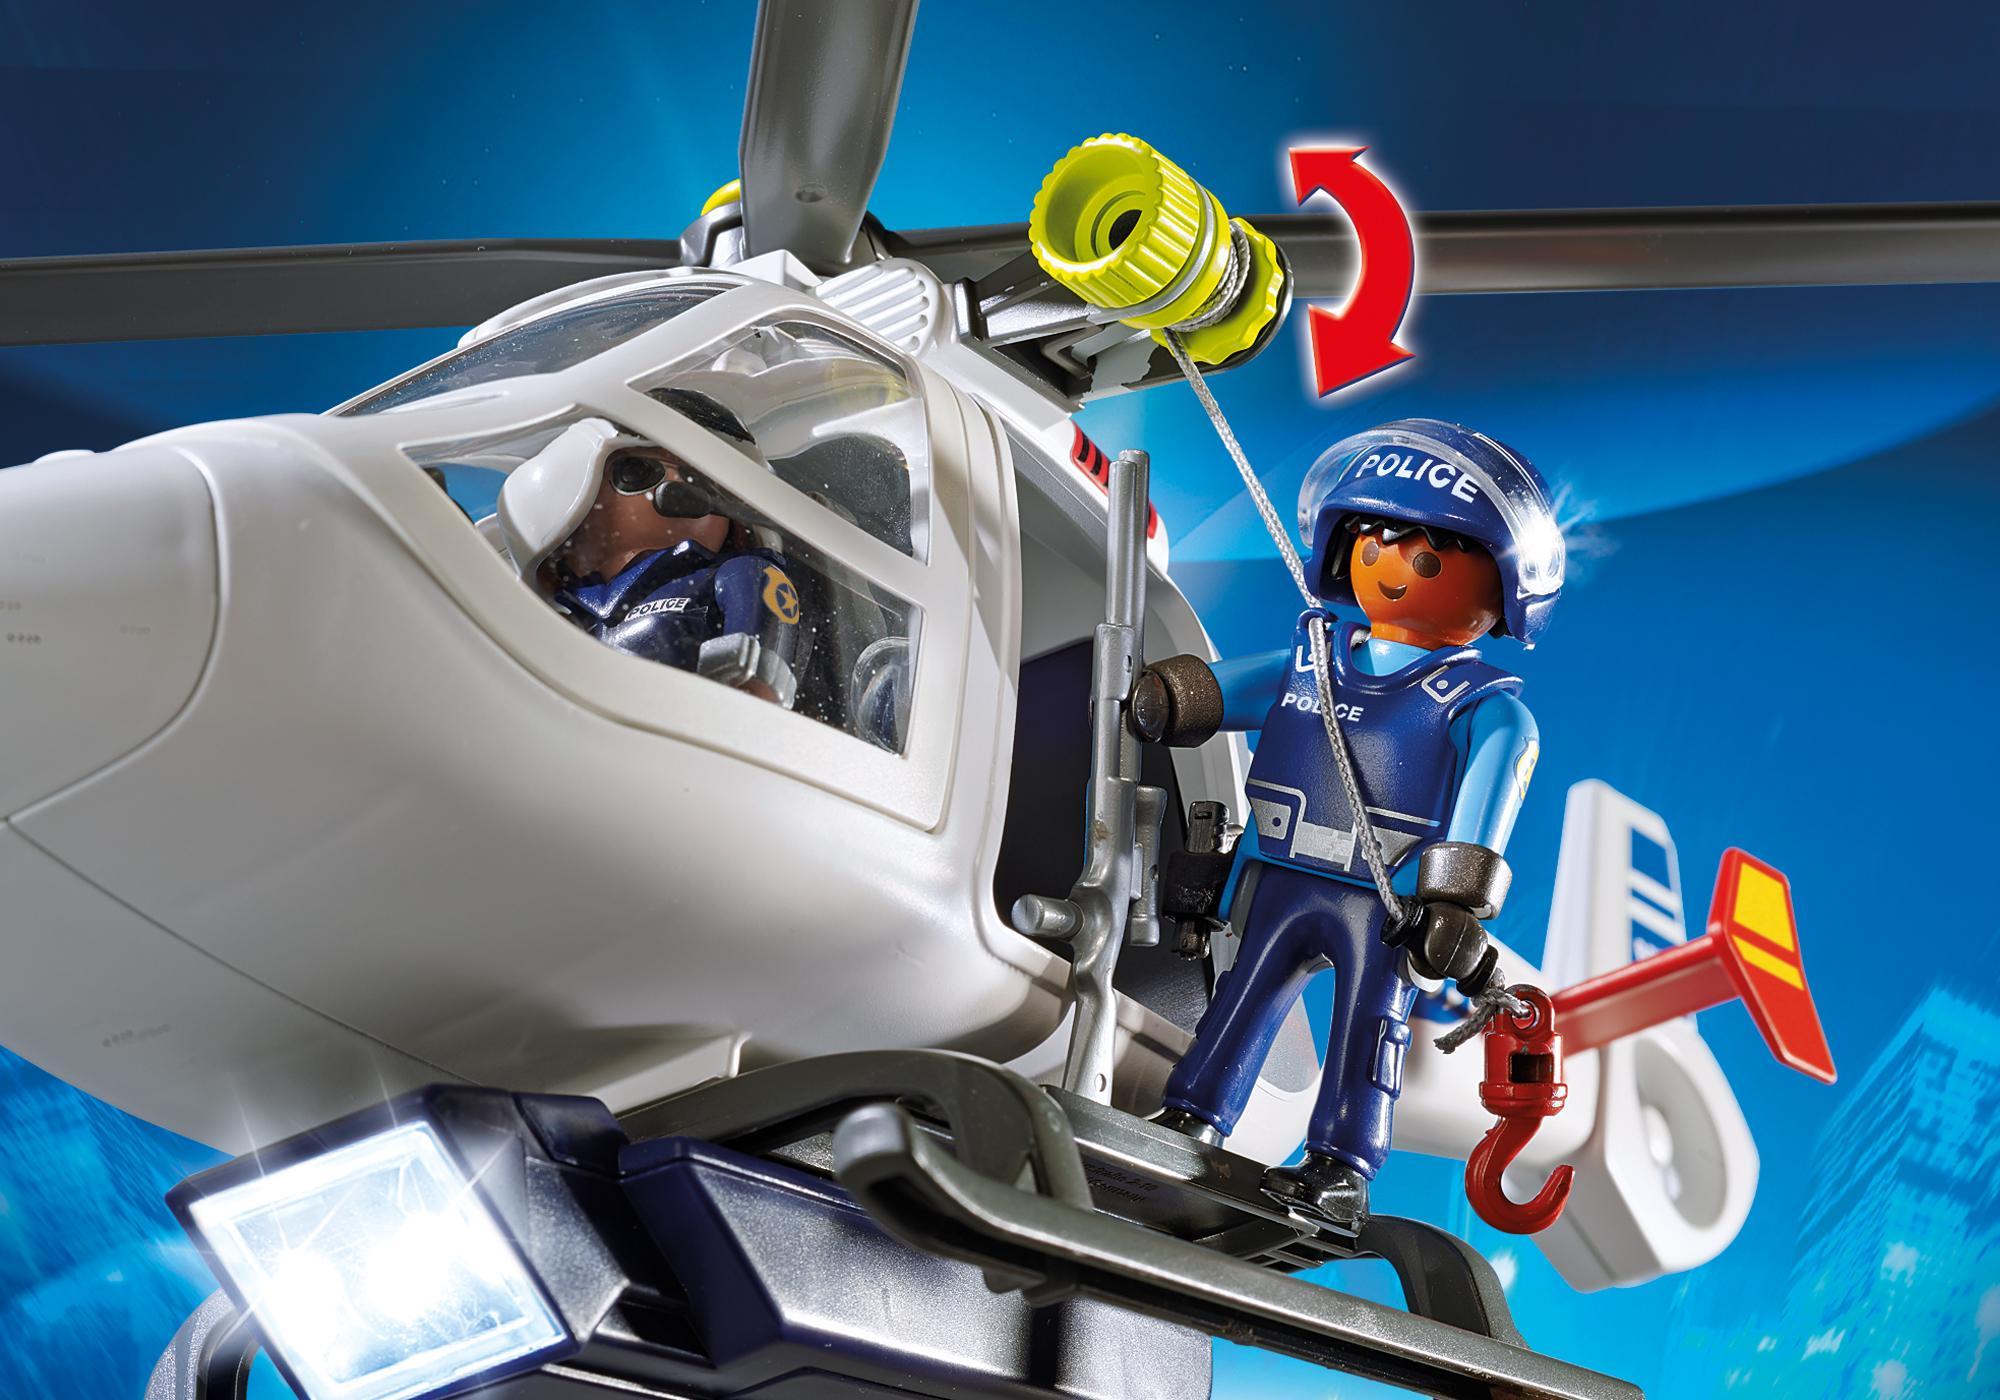 http://media.playmobil.com/i/playmobil/6921_product_extra2/Hélicoptère de police avec projecteur de recherche